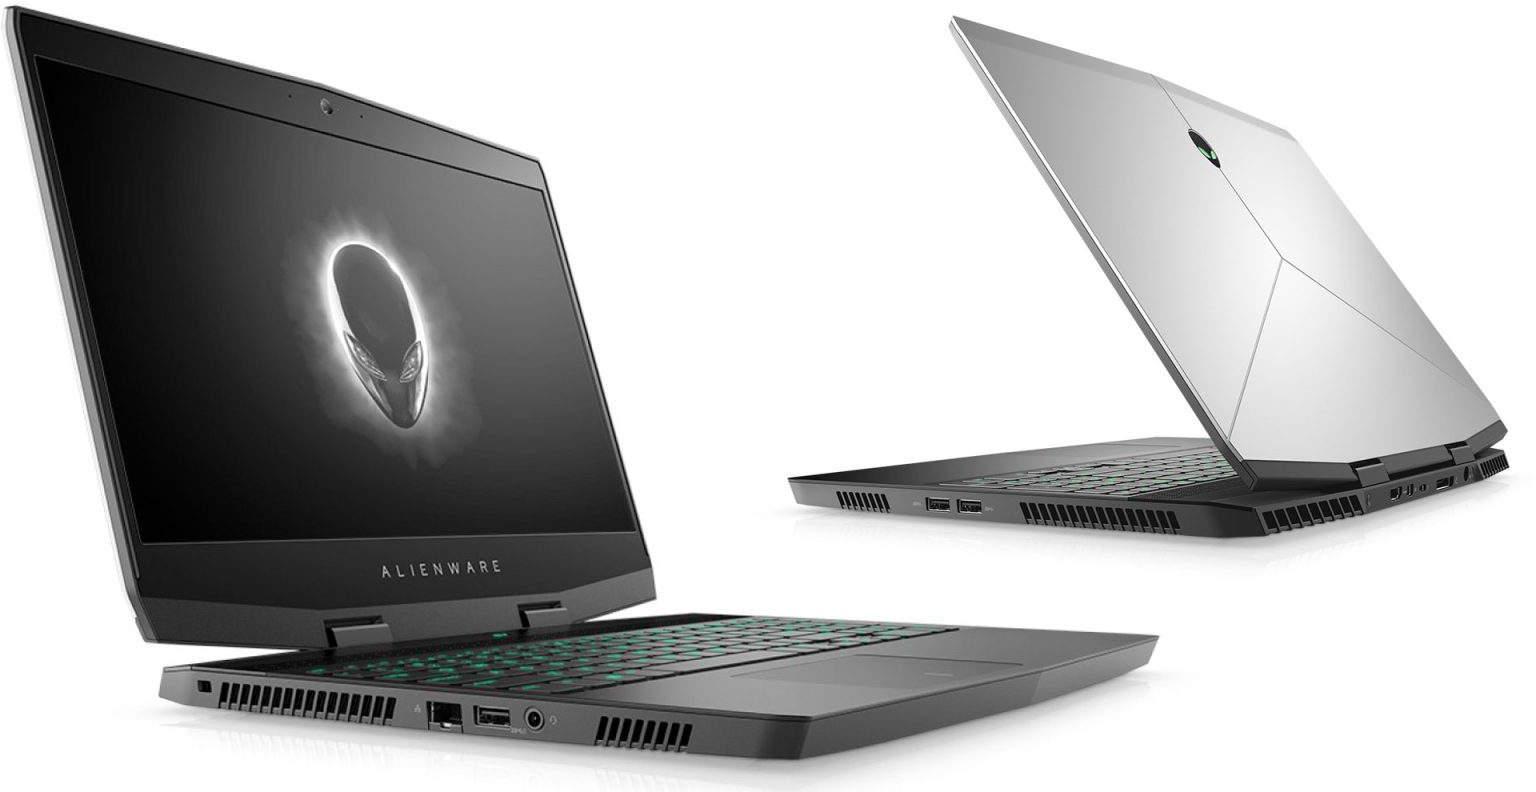 Купить Ноутбук Dell Alienware M15 (M15-5614) фото 3